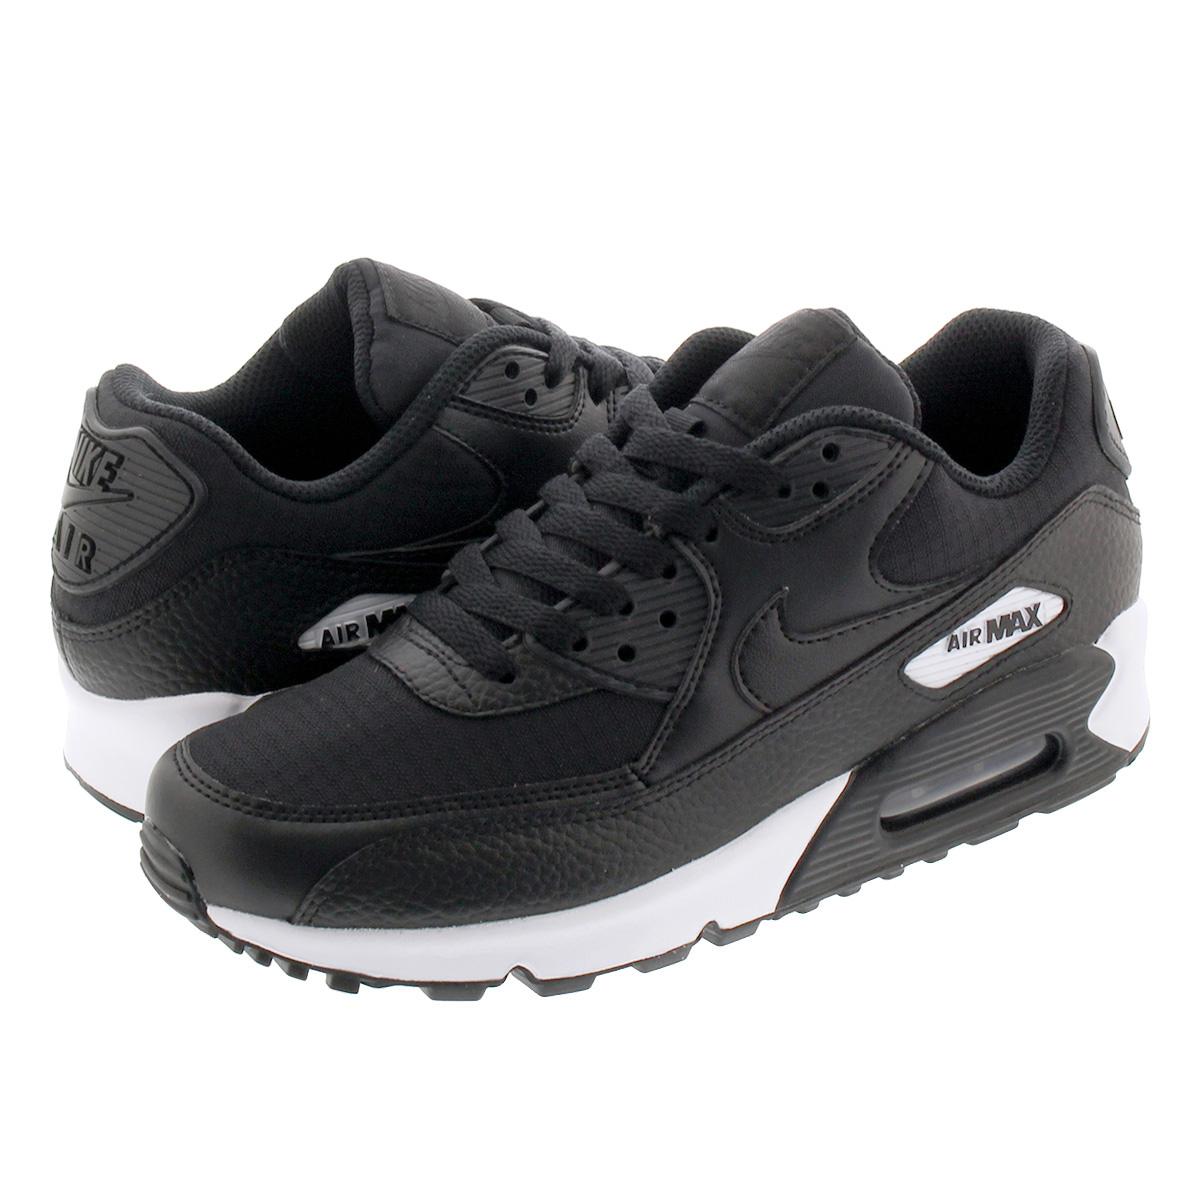 NIKE Kie Ney AMAX sneakers men gap Dis AIR MAX 90 ESSENTIAL 537,384 064 shoes gray